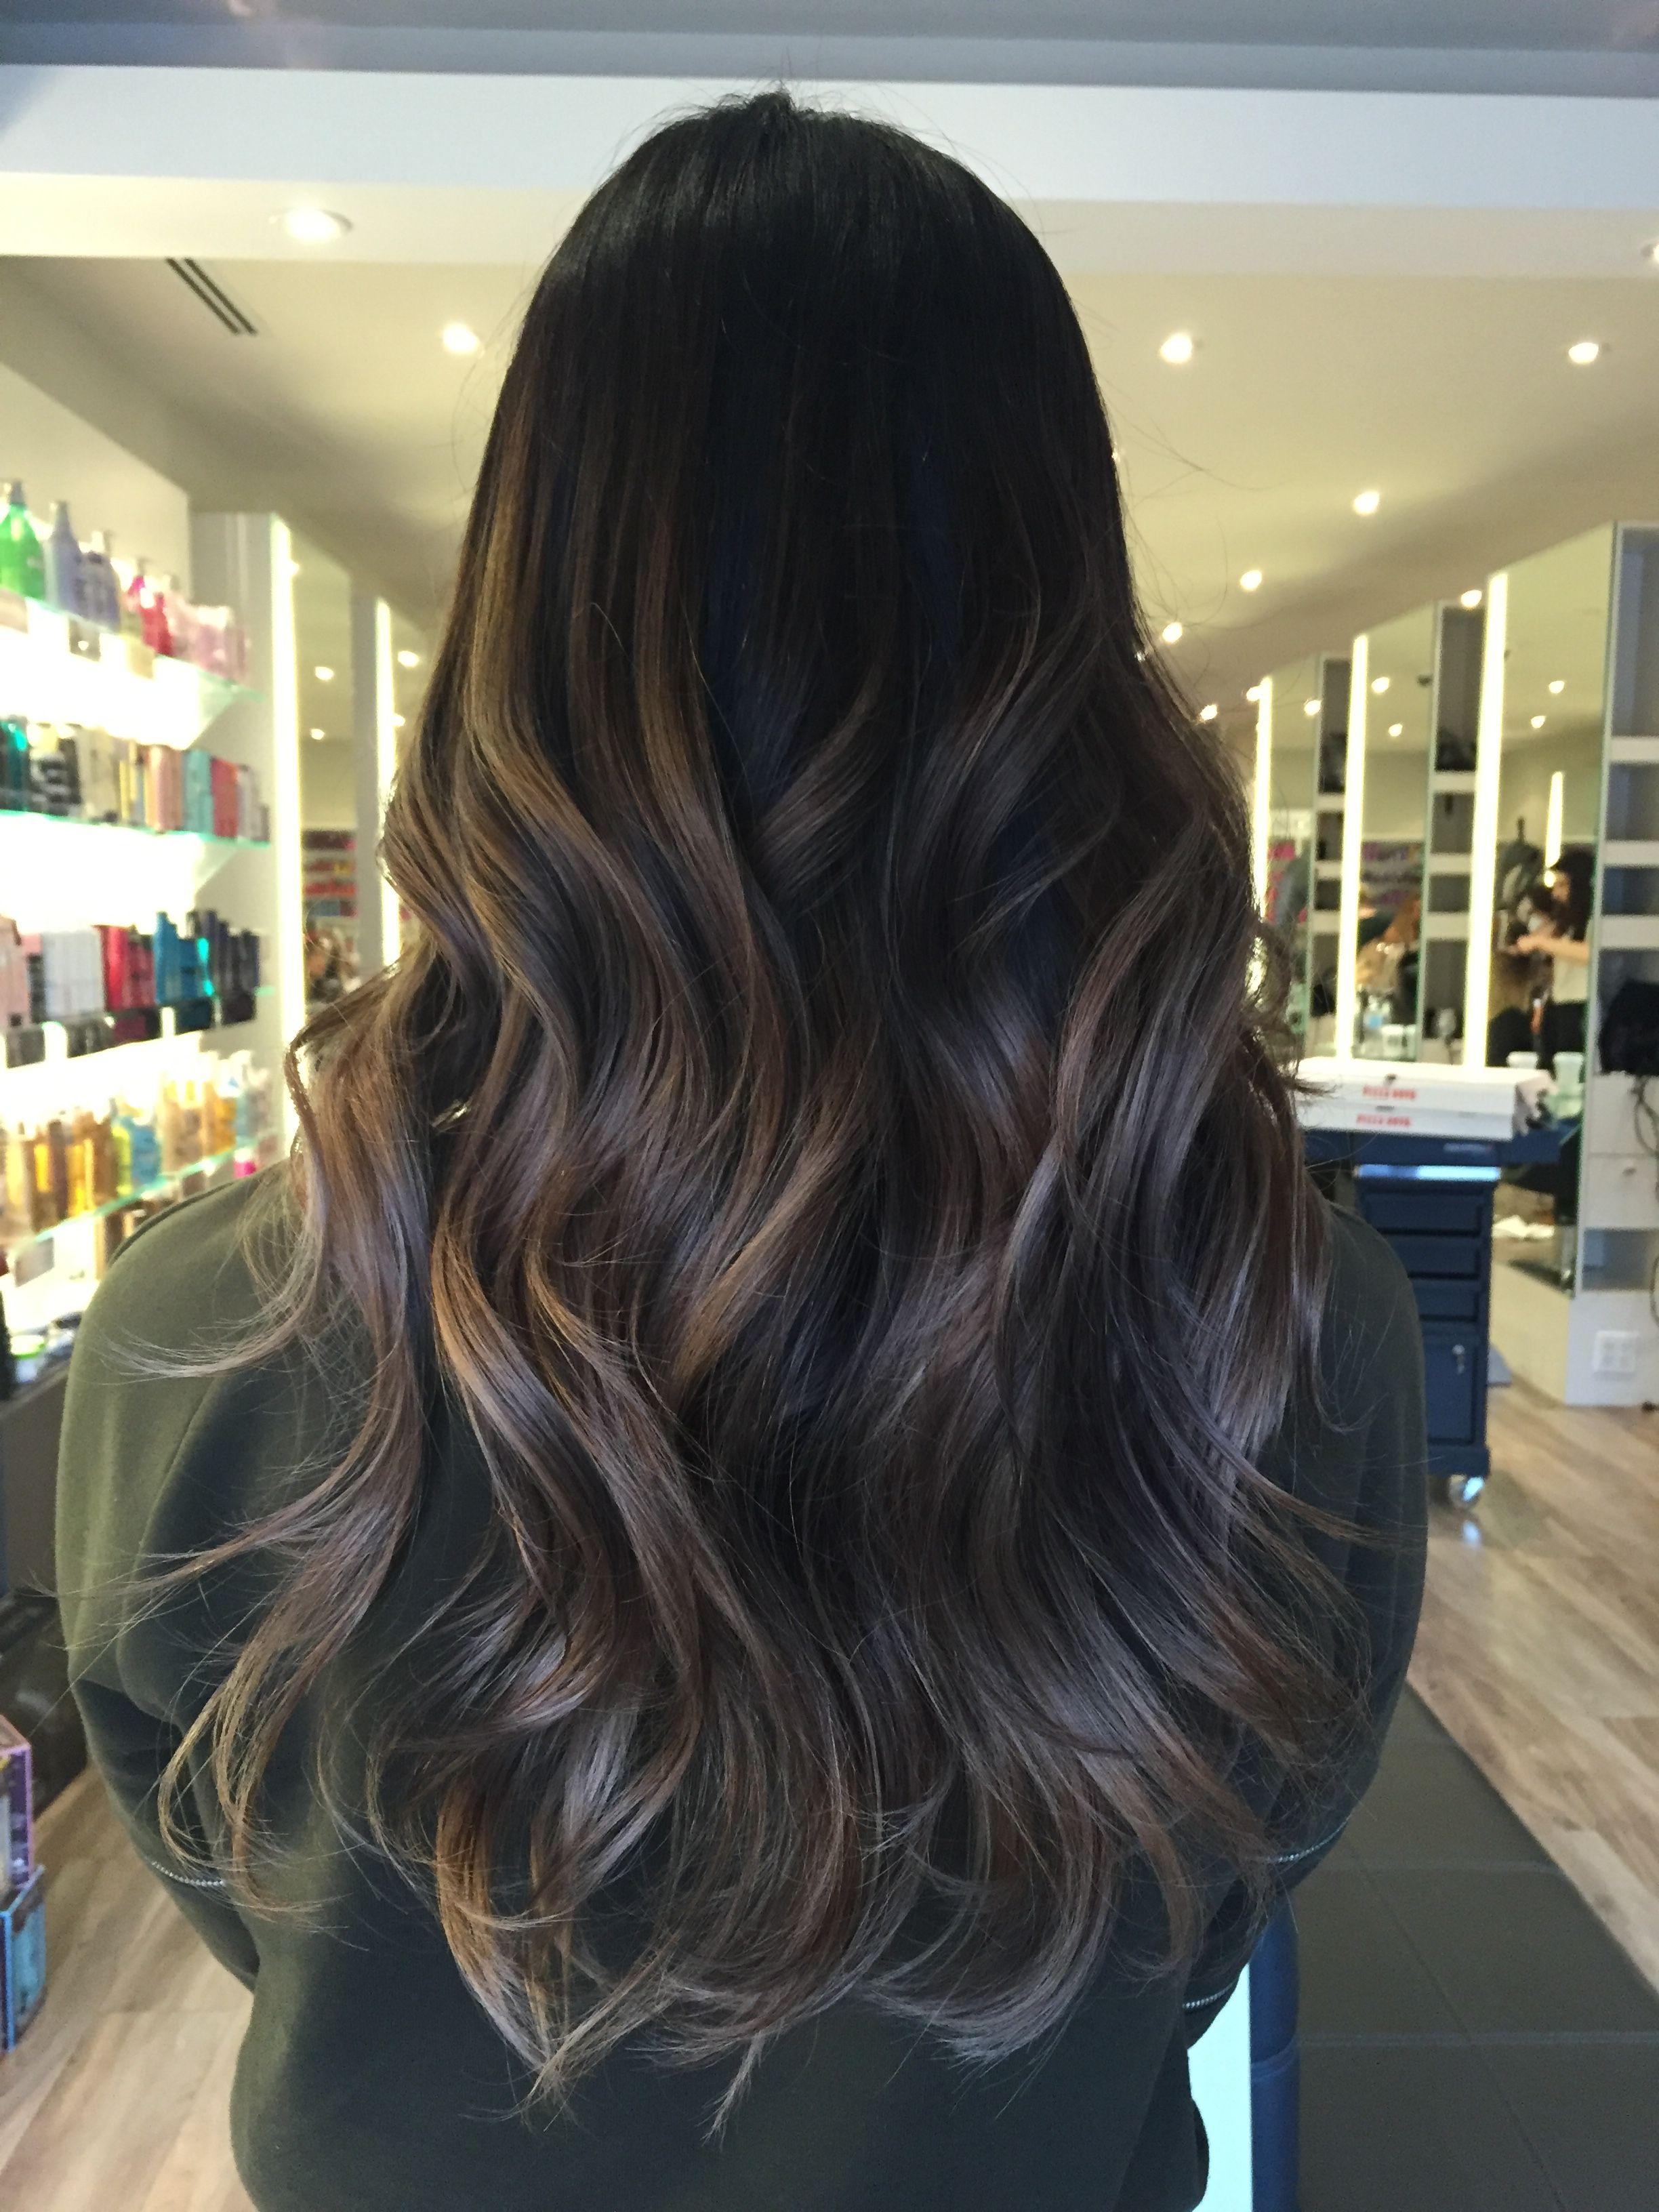 Bronde Balayage Hair Color Ash Hair Color Balayage Hair Brunette Hair Color